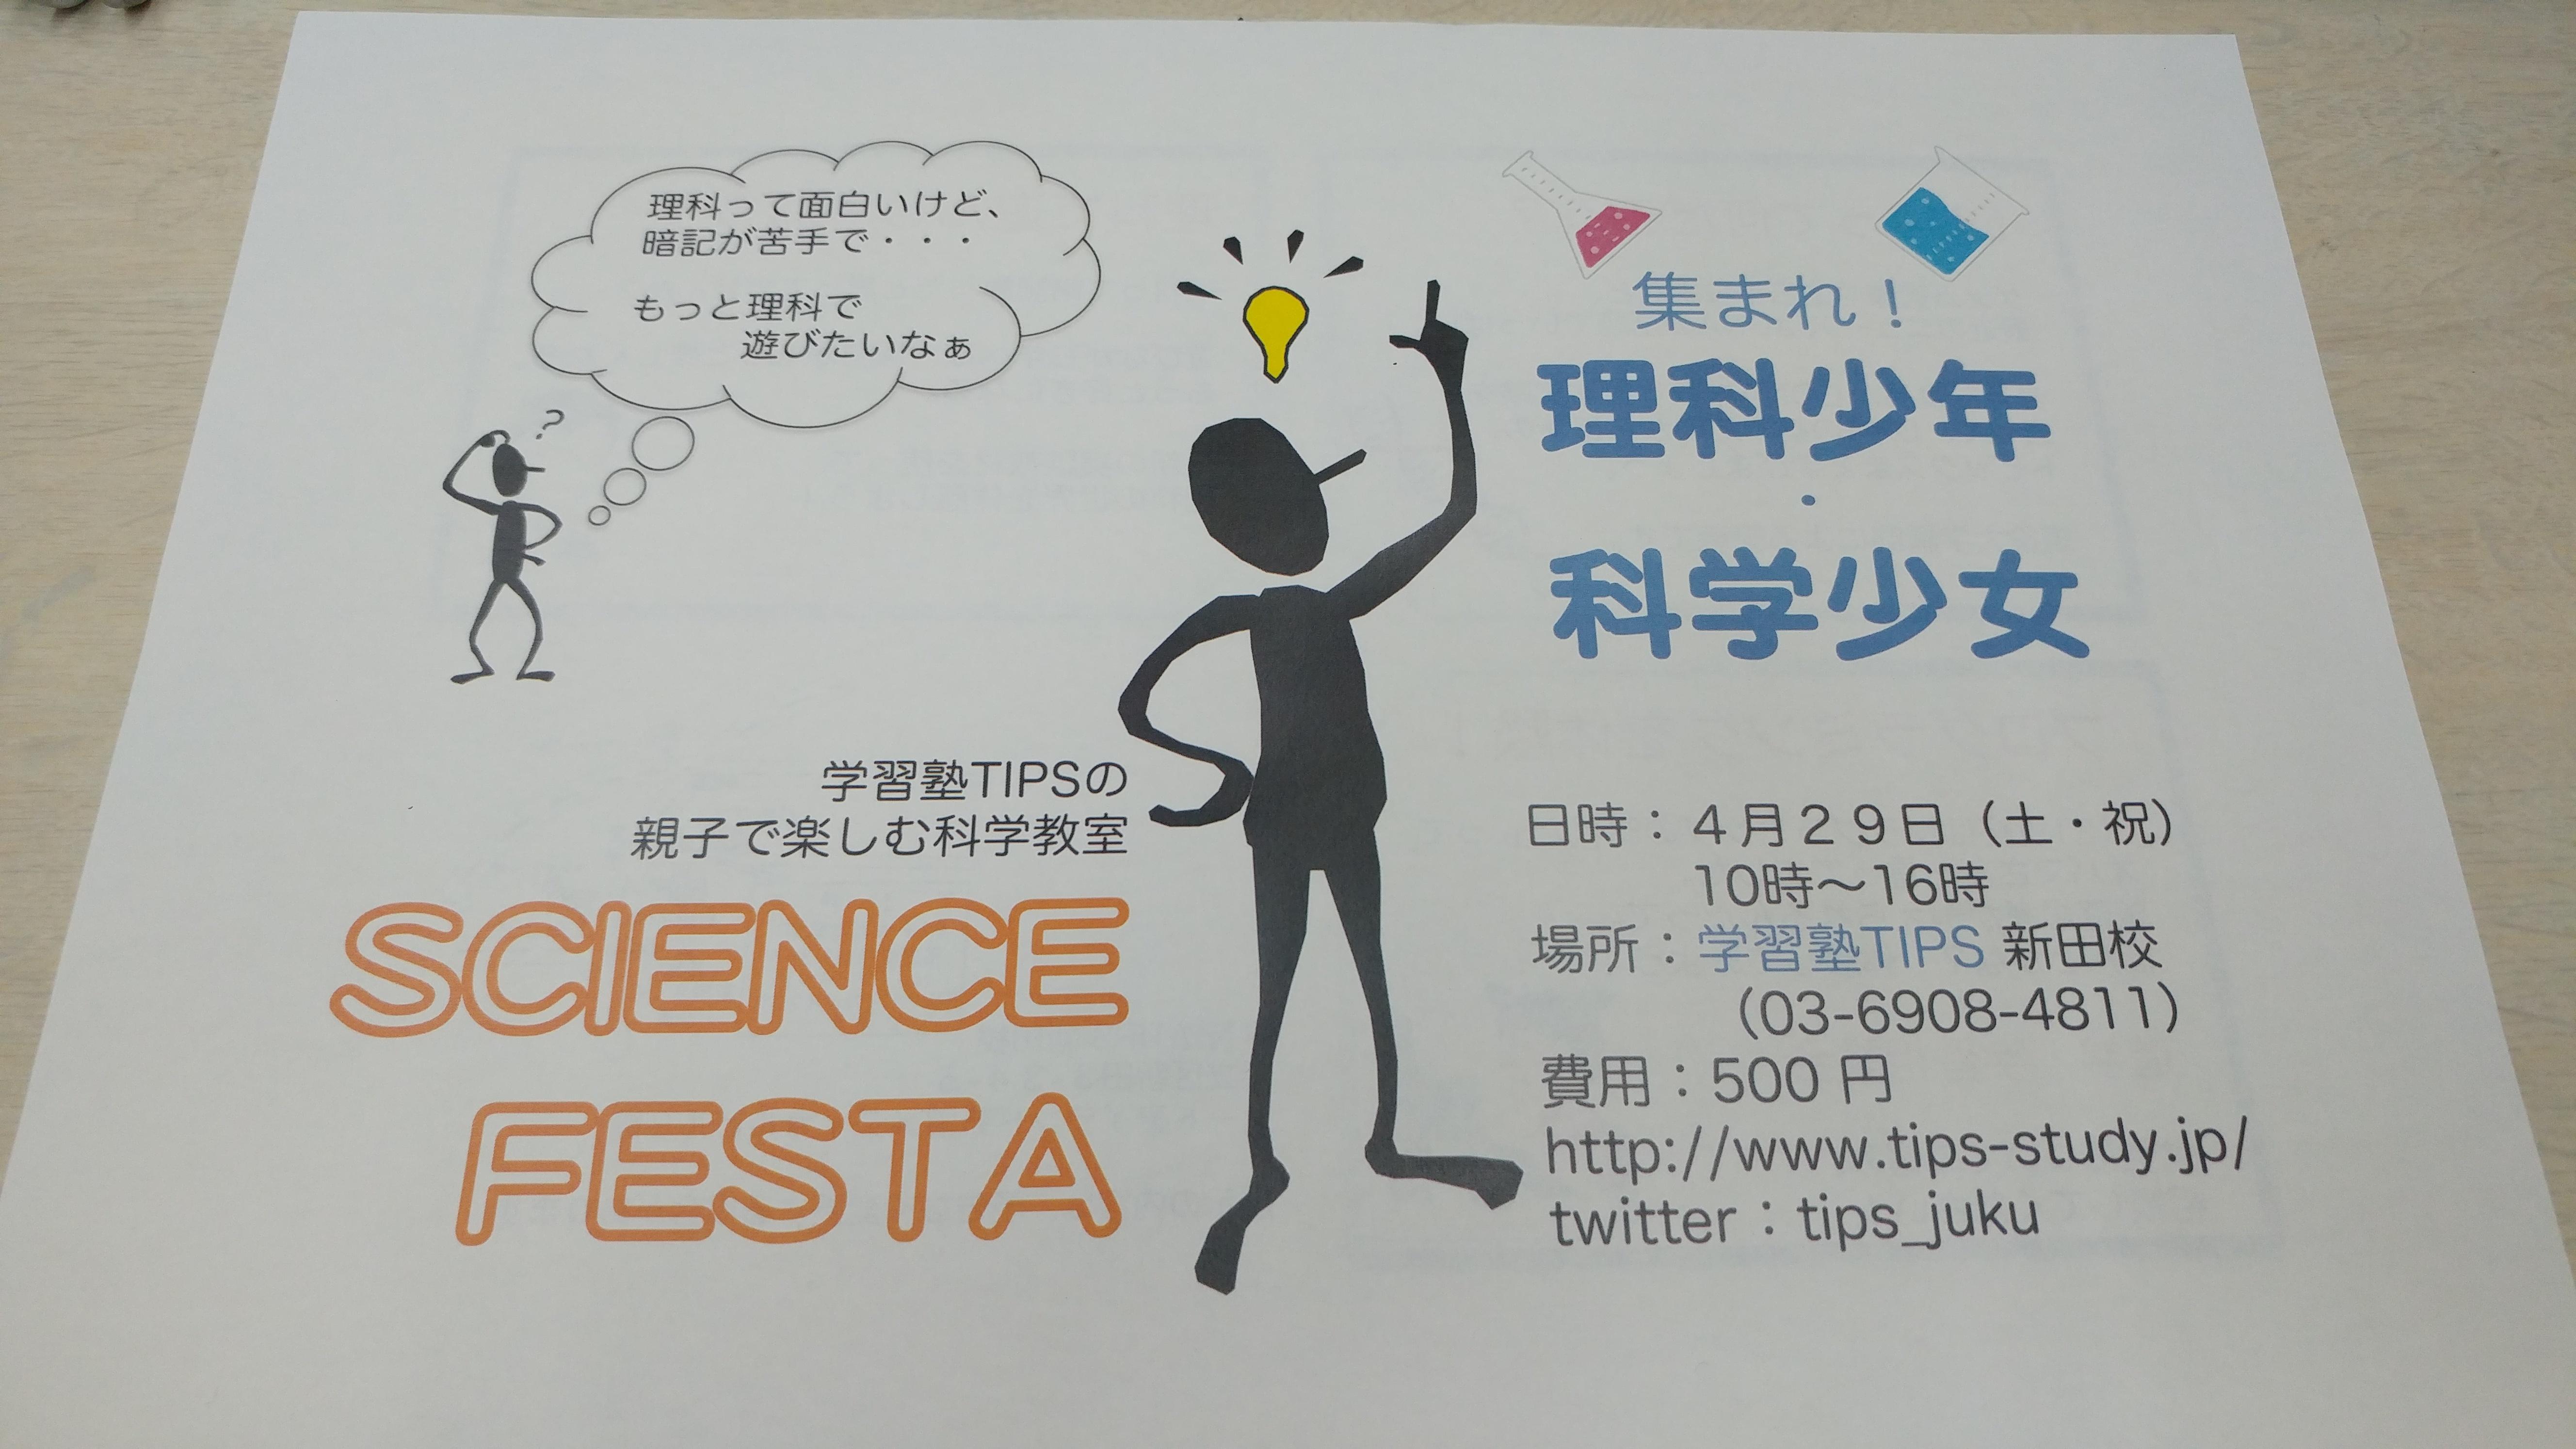 ☆TIPSサイエンスフェスタ開催☆